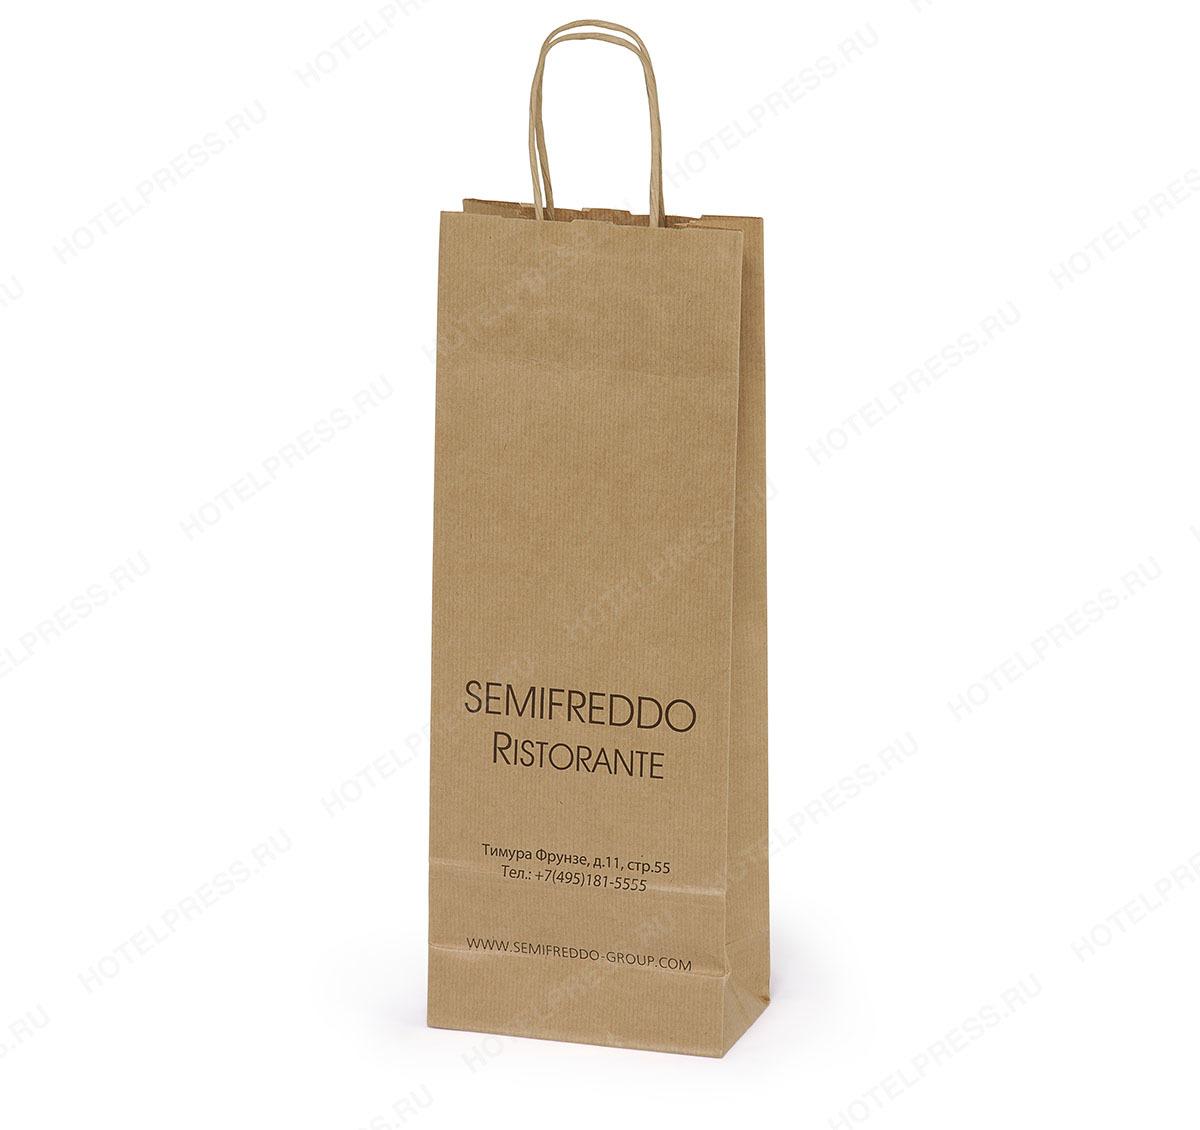 Крафтовый пакет под бутылку ресторана SEMIFREDDO